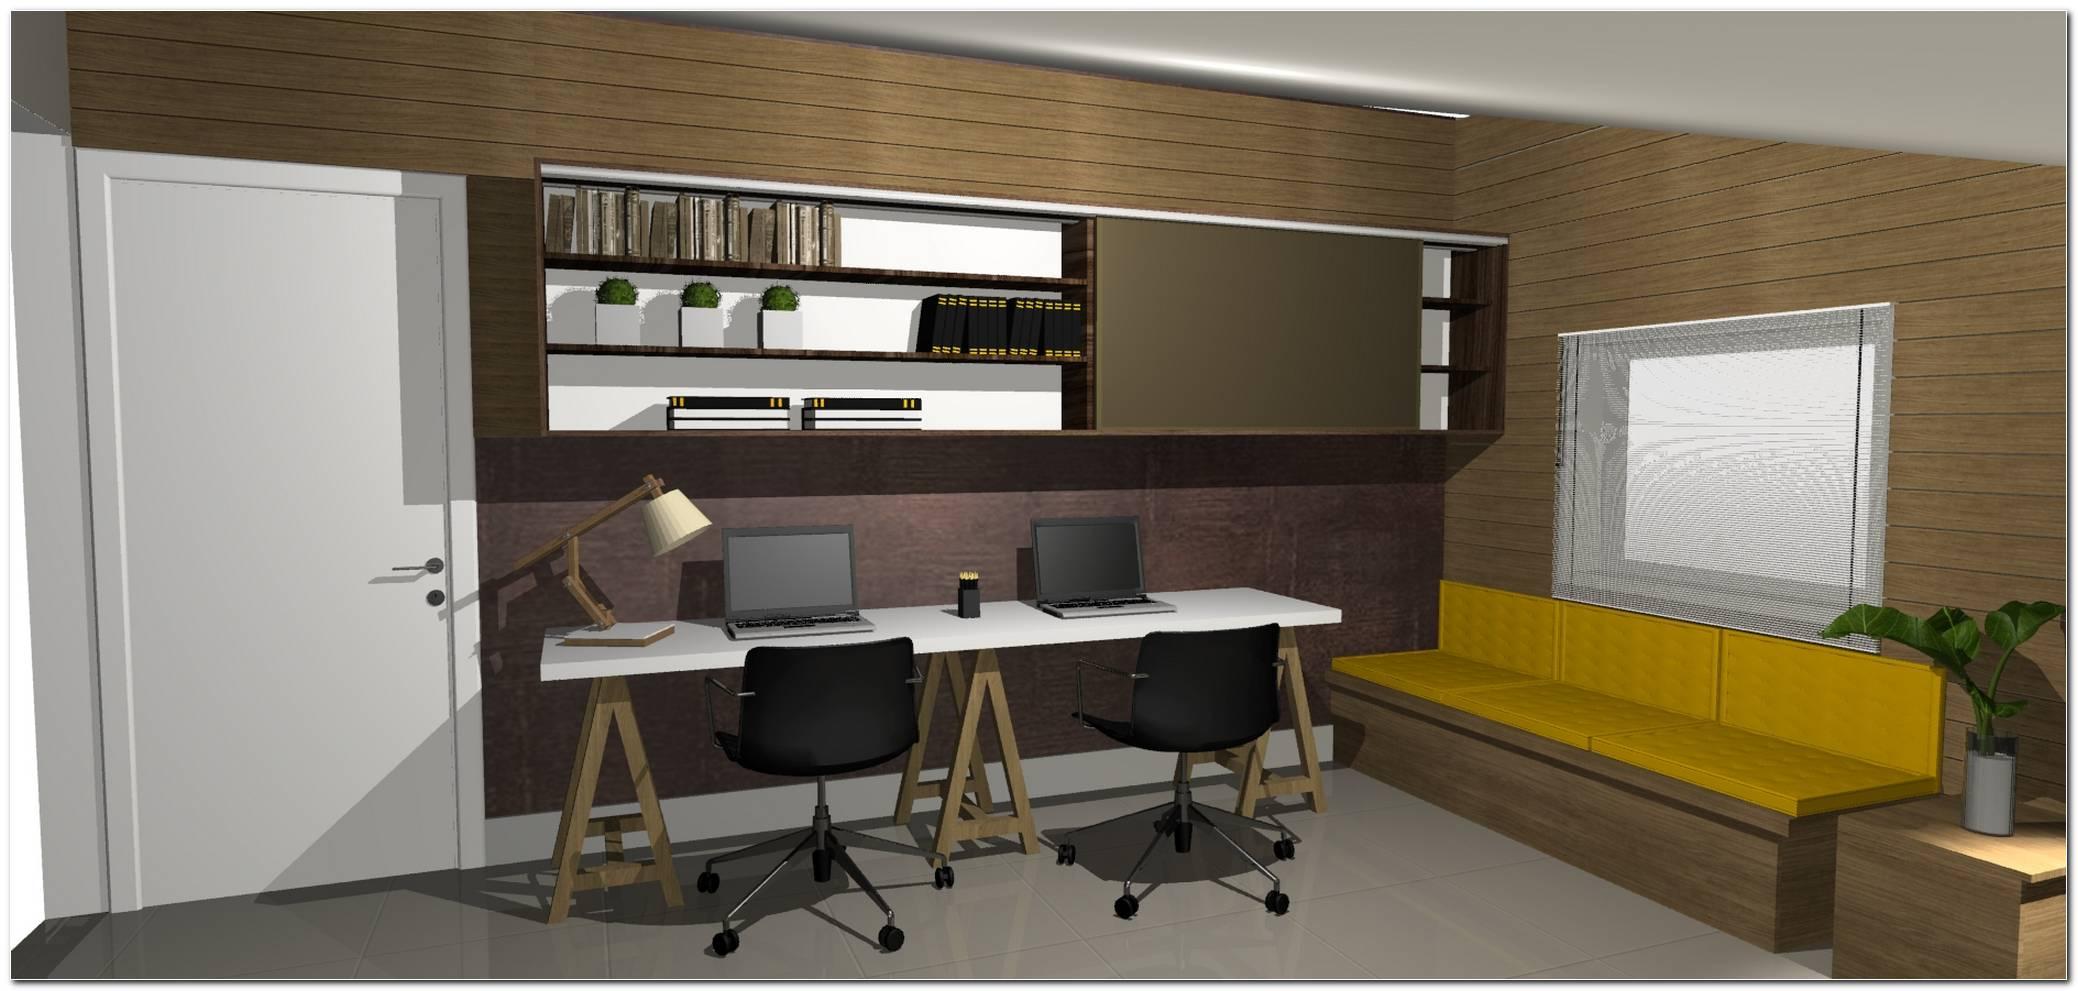 Projetos De Interiores Online